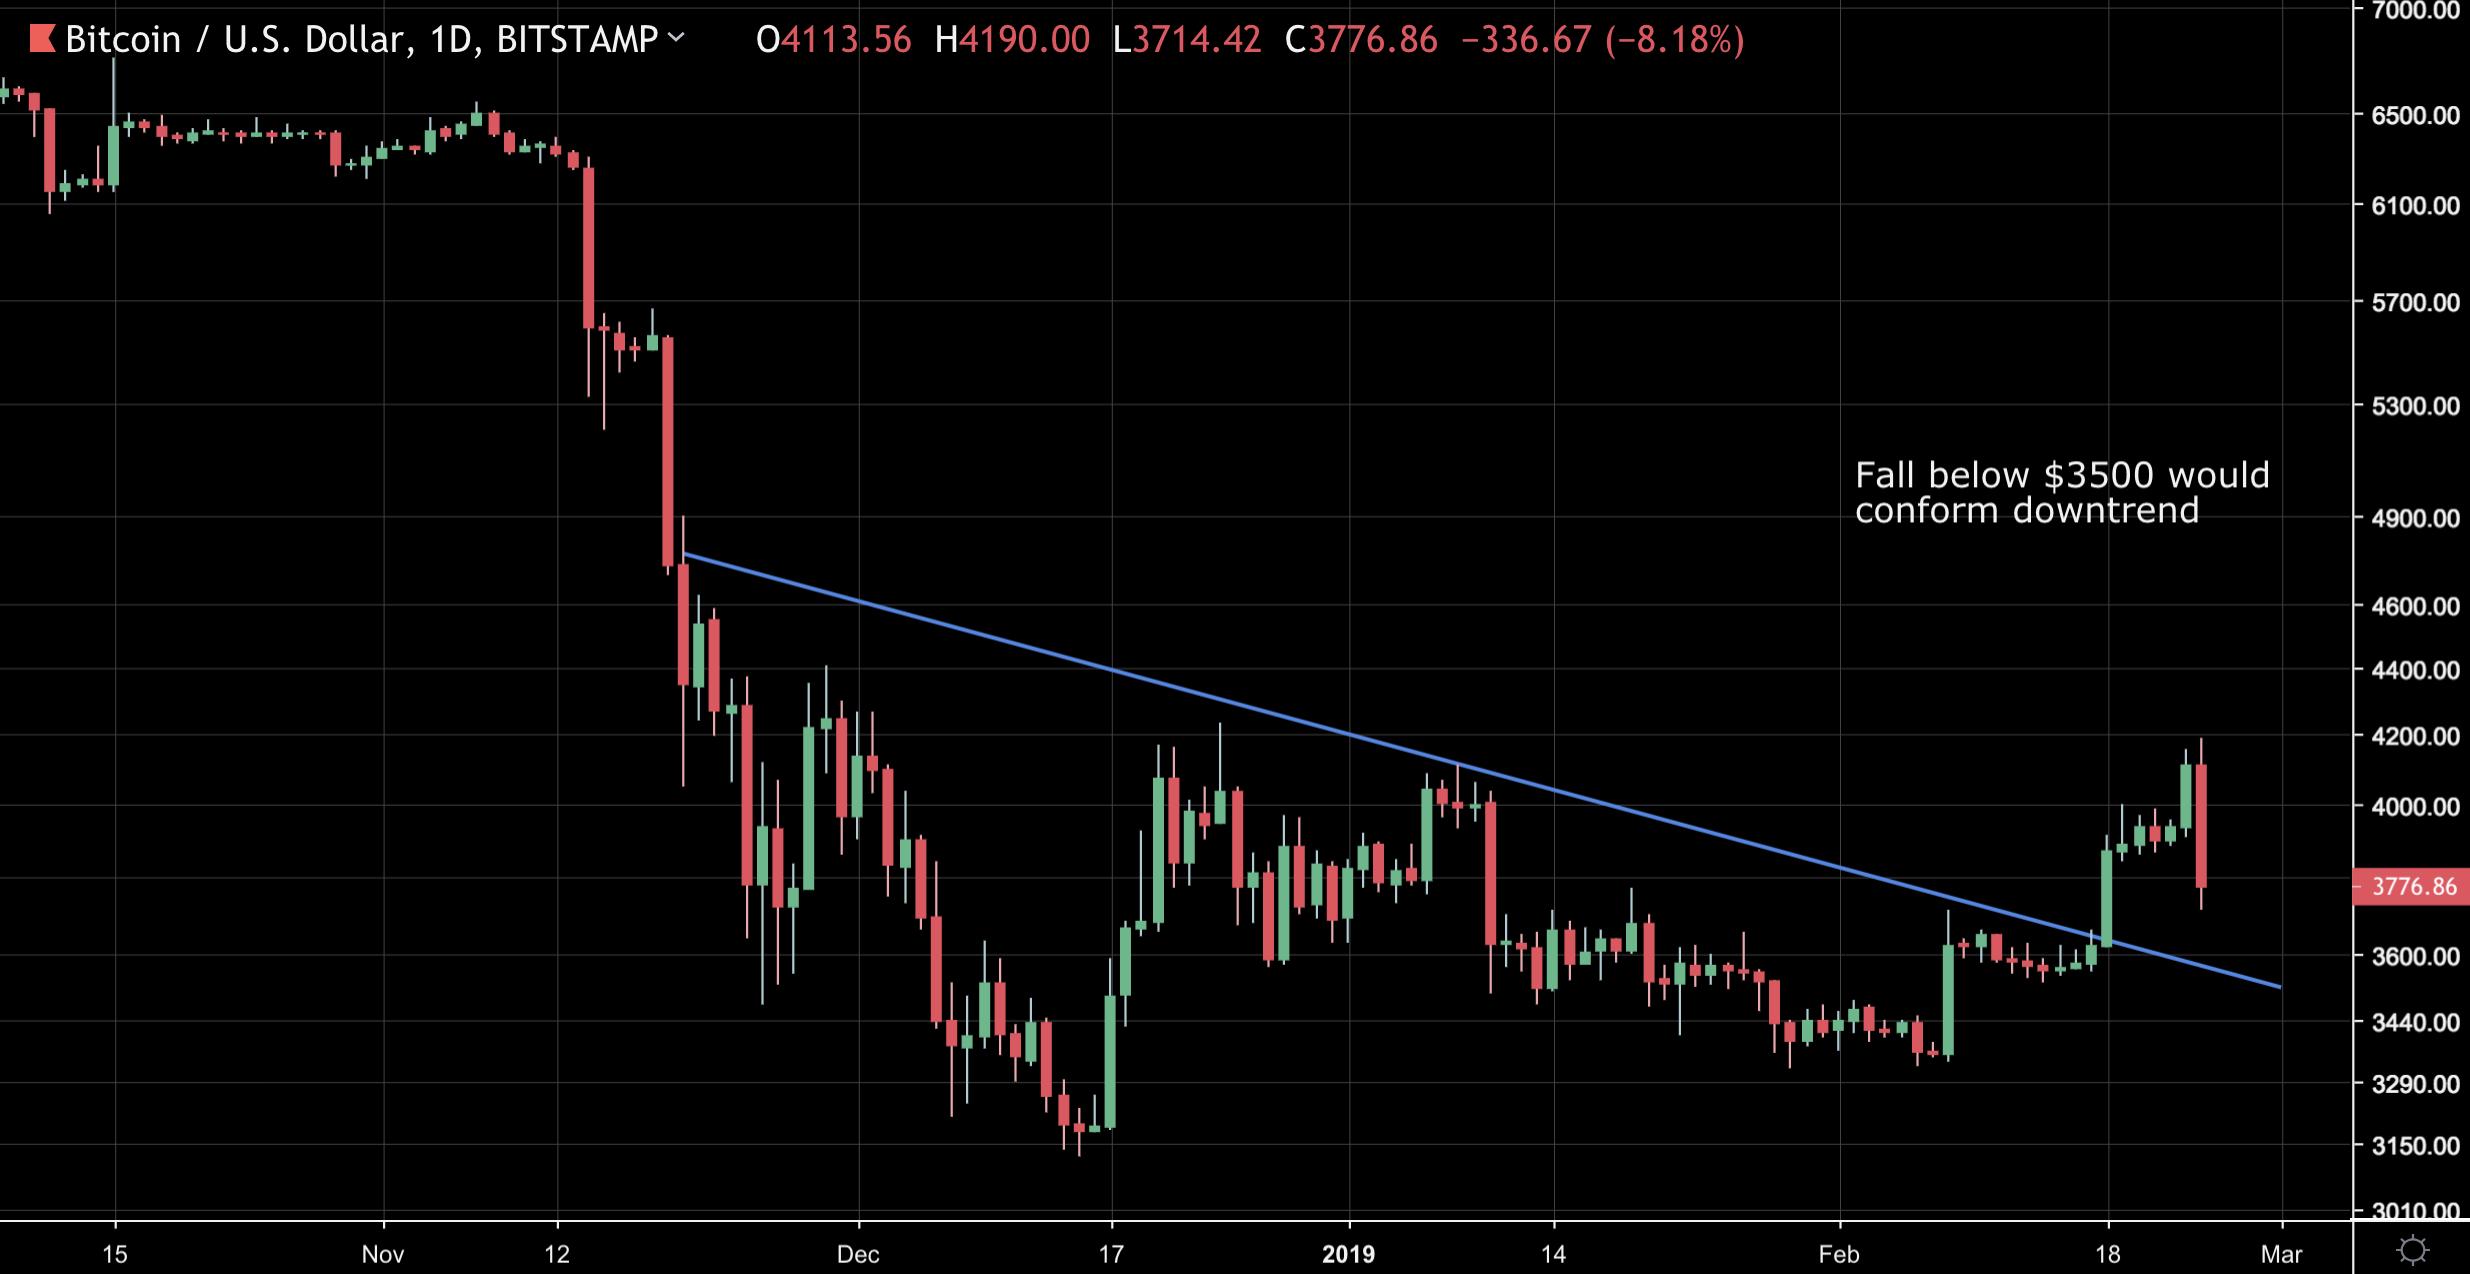 Bitcoin (BTC) Drops $400 As Rally Goes Into Sharp Reverse 14